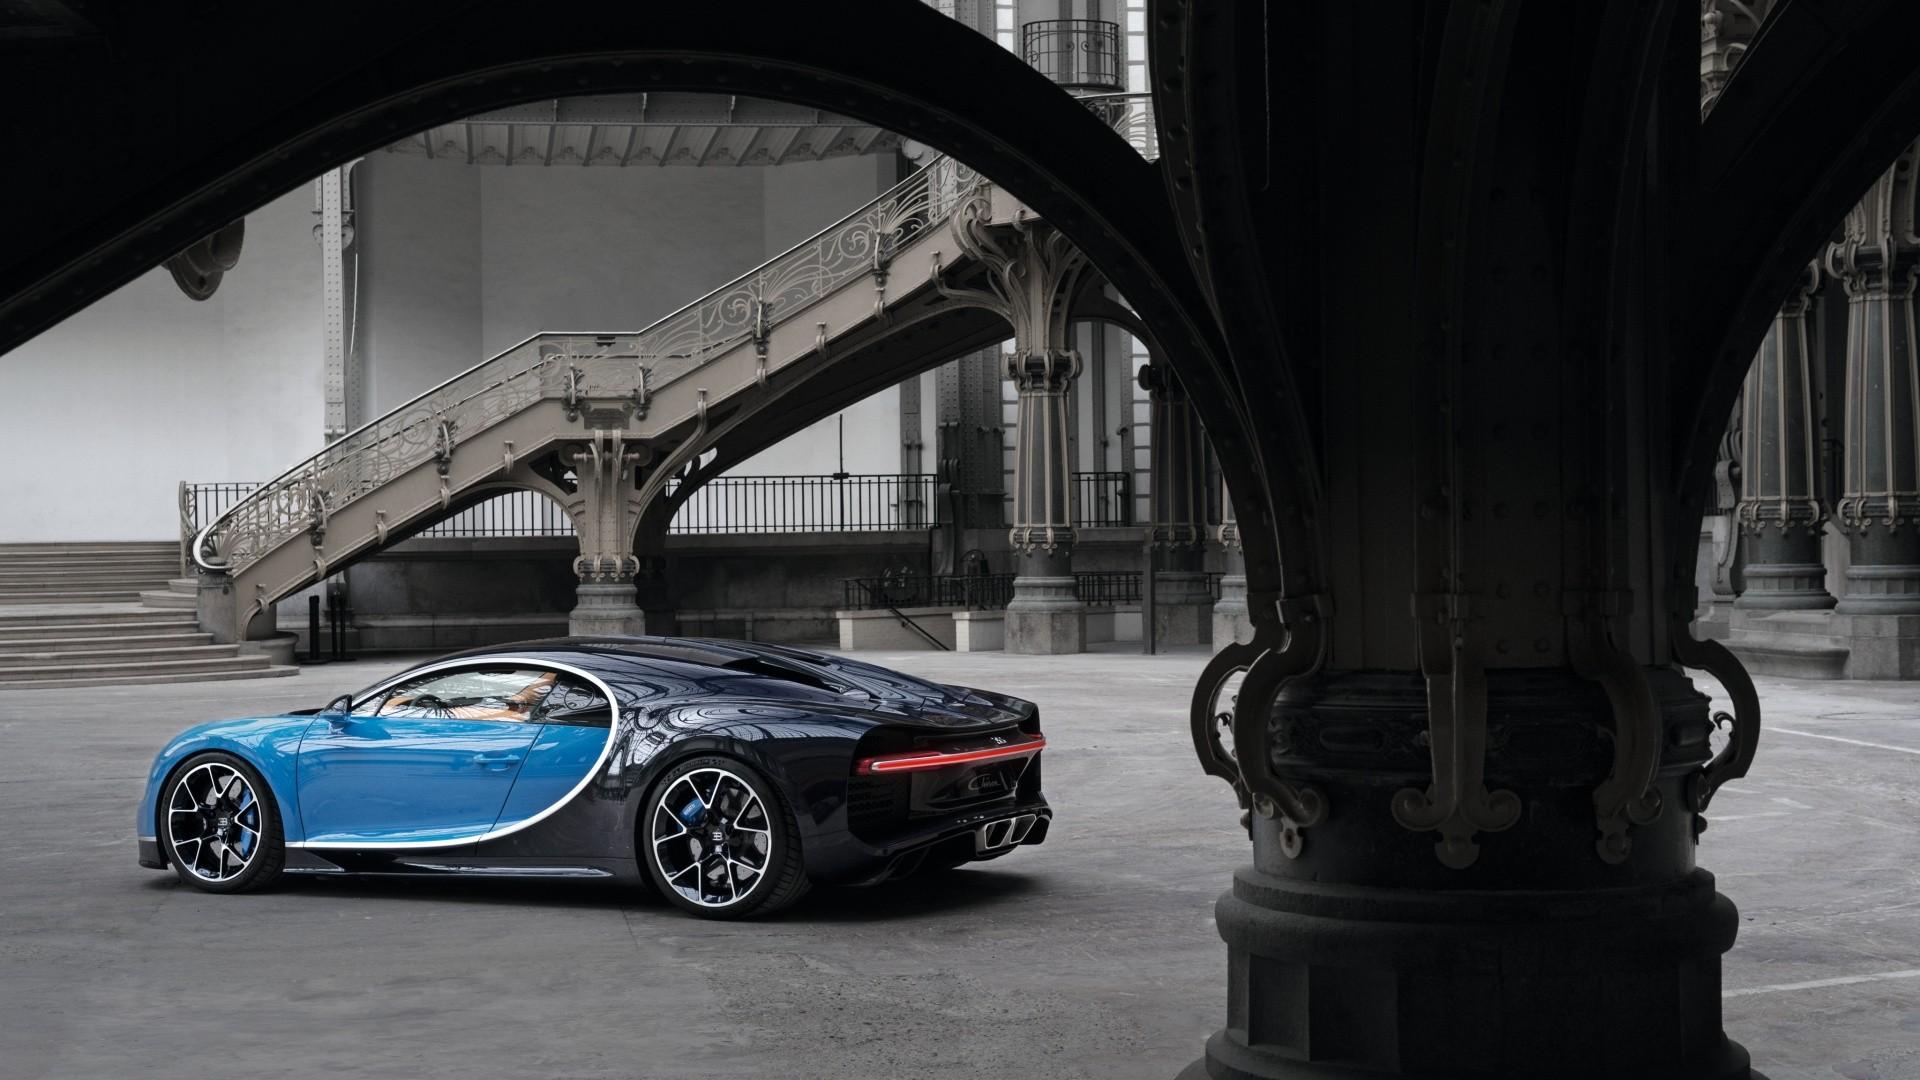 Bugatti Chiron Free Download Wallpaper